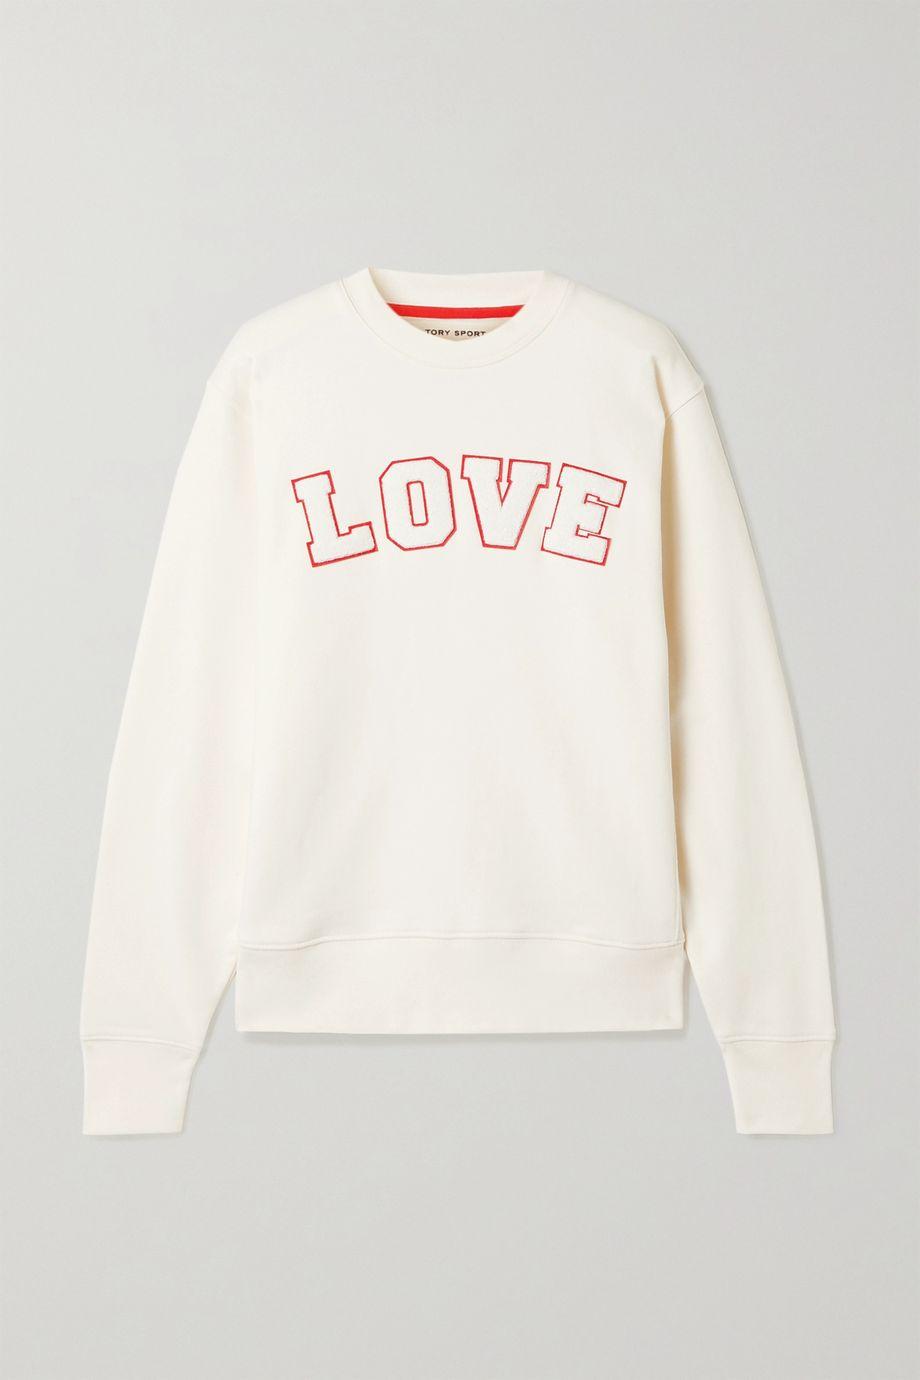 Tory Sport Appliquéd French cotton-terry sweatshirt